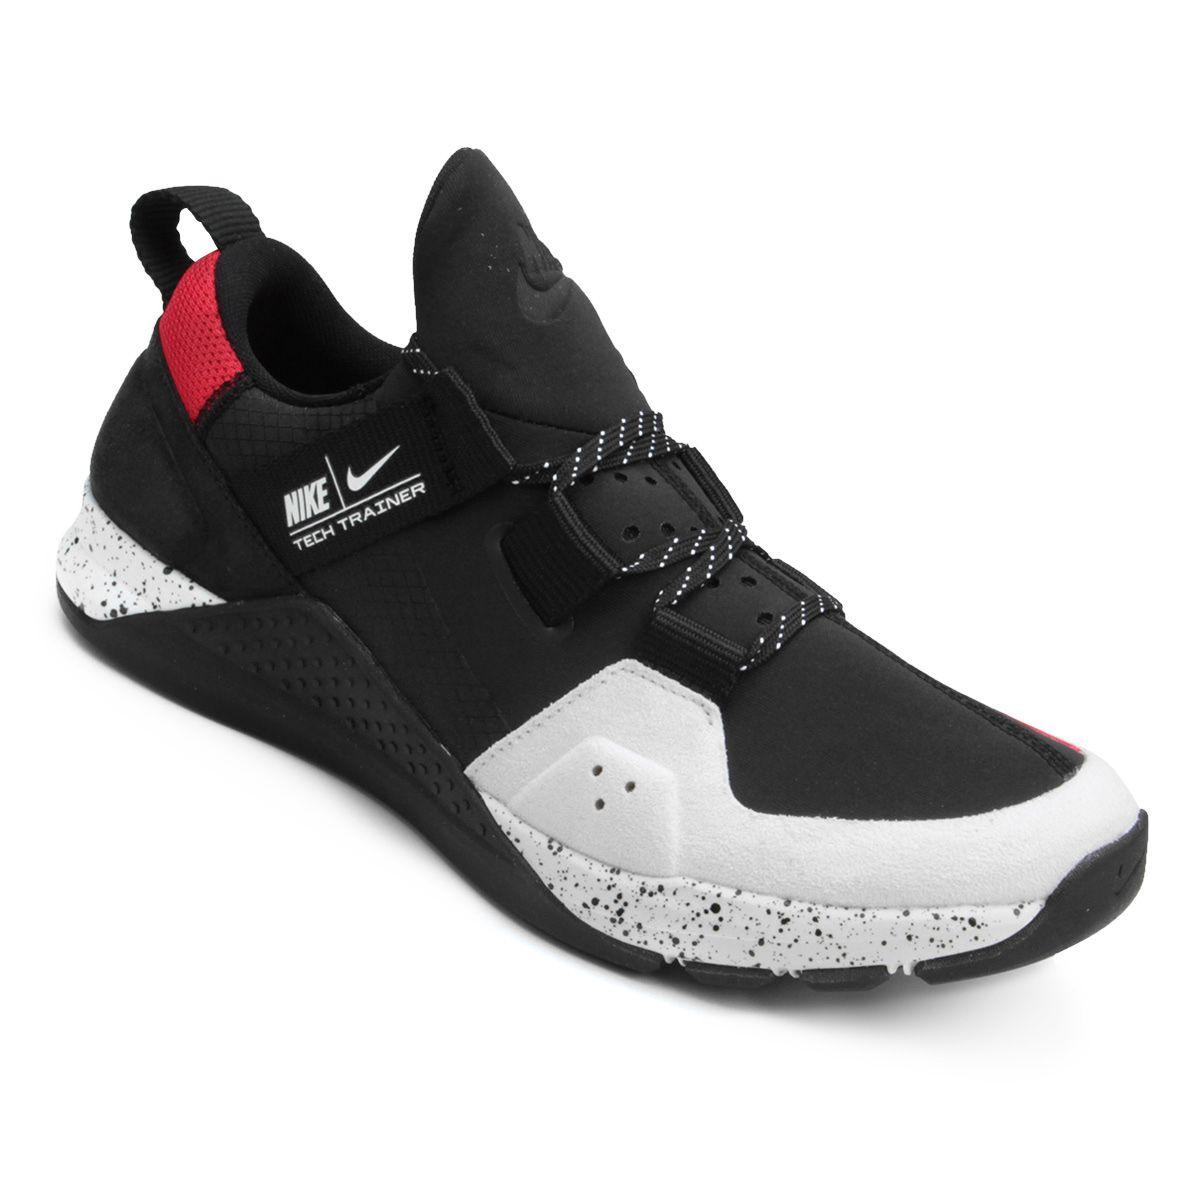 Tênis Masculino Nike Tech Trainer